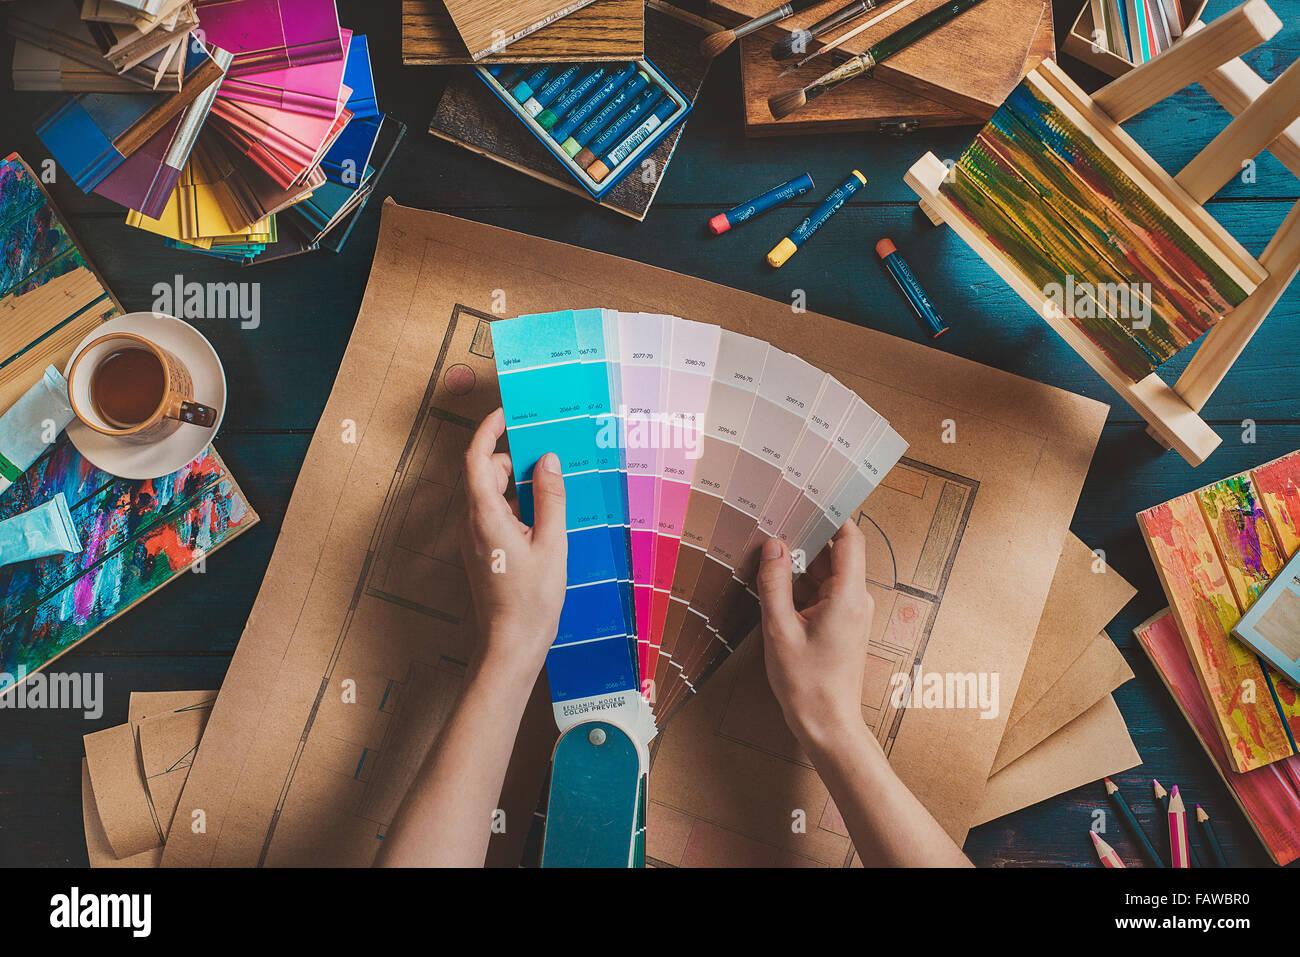 Designer Arbeitsplatz mit kreativ-Tools und Farbmuster Stockbild